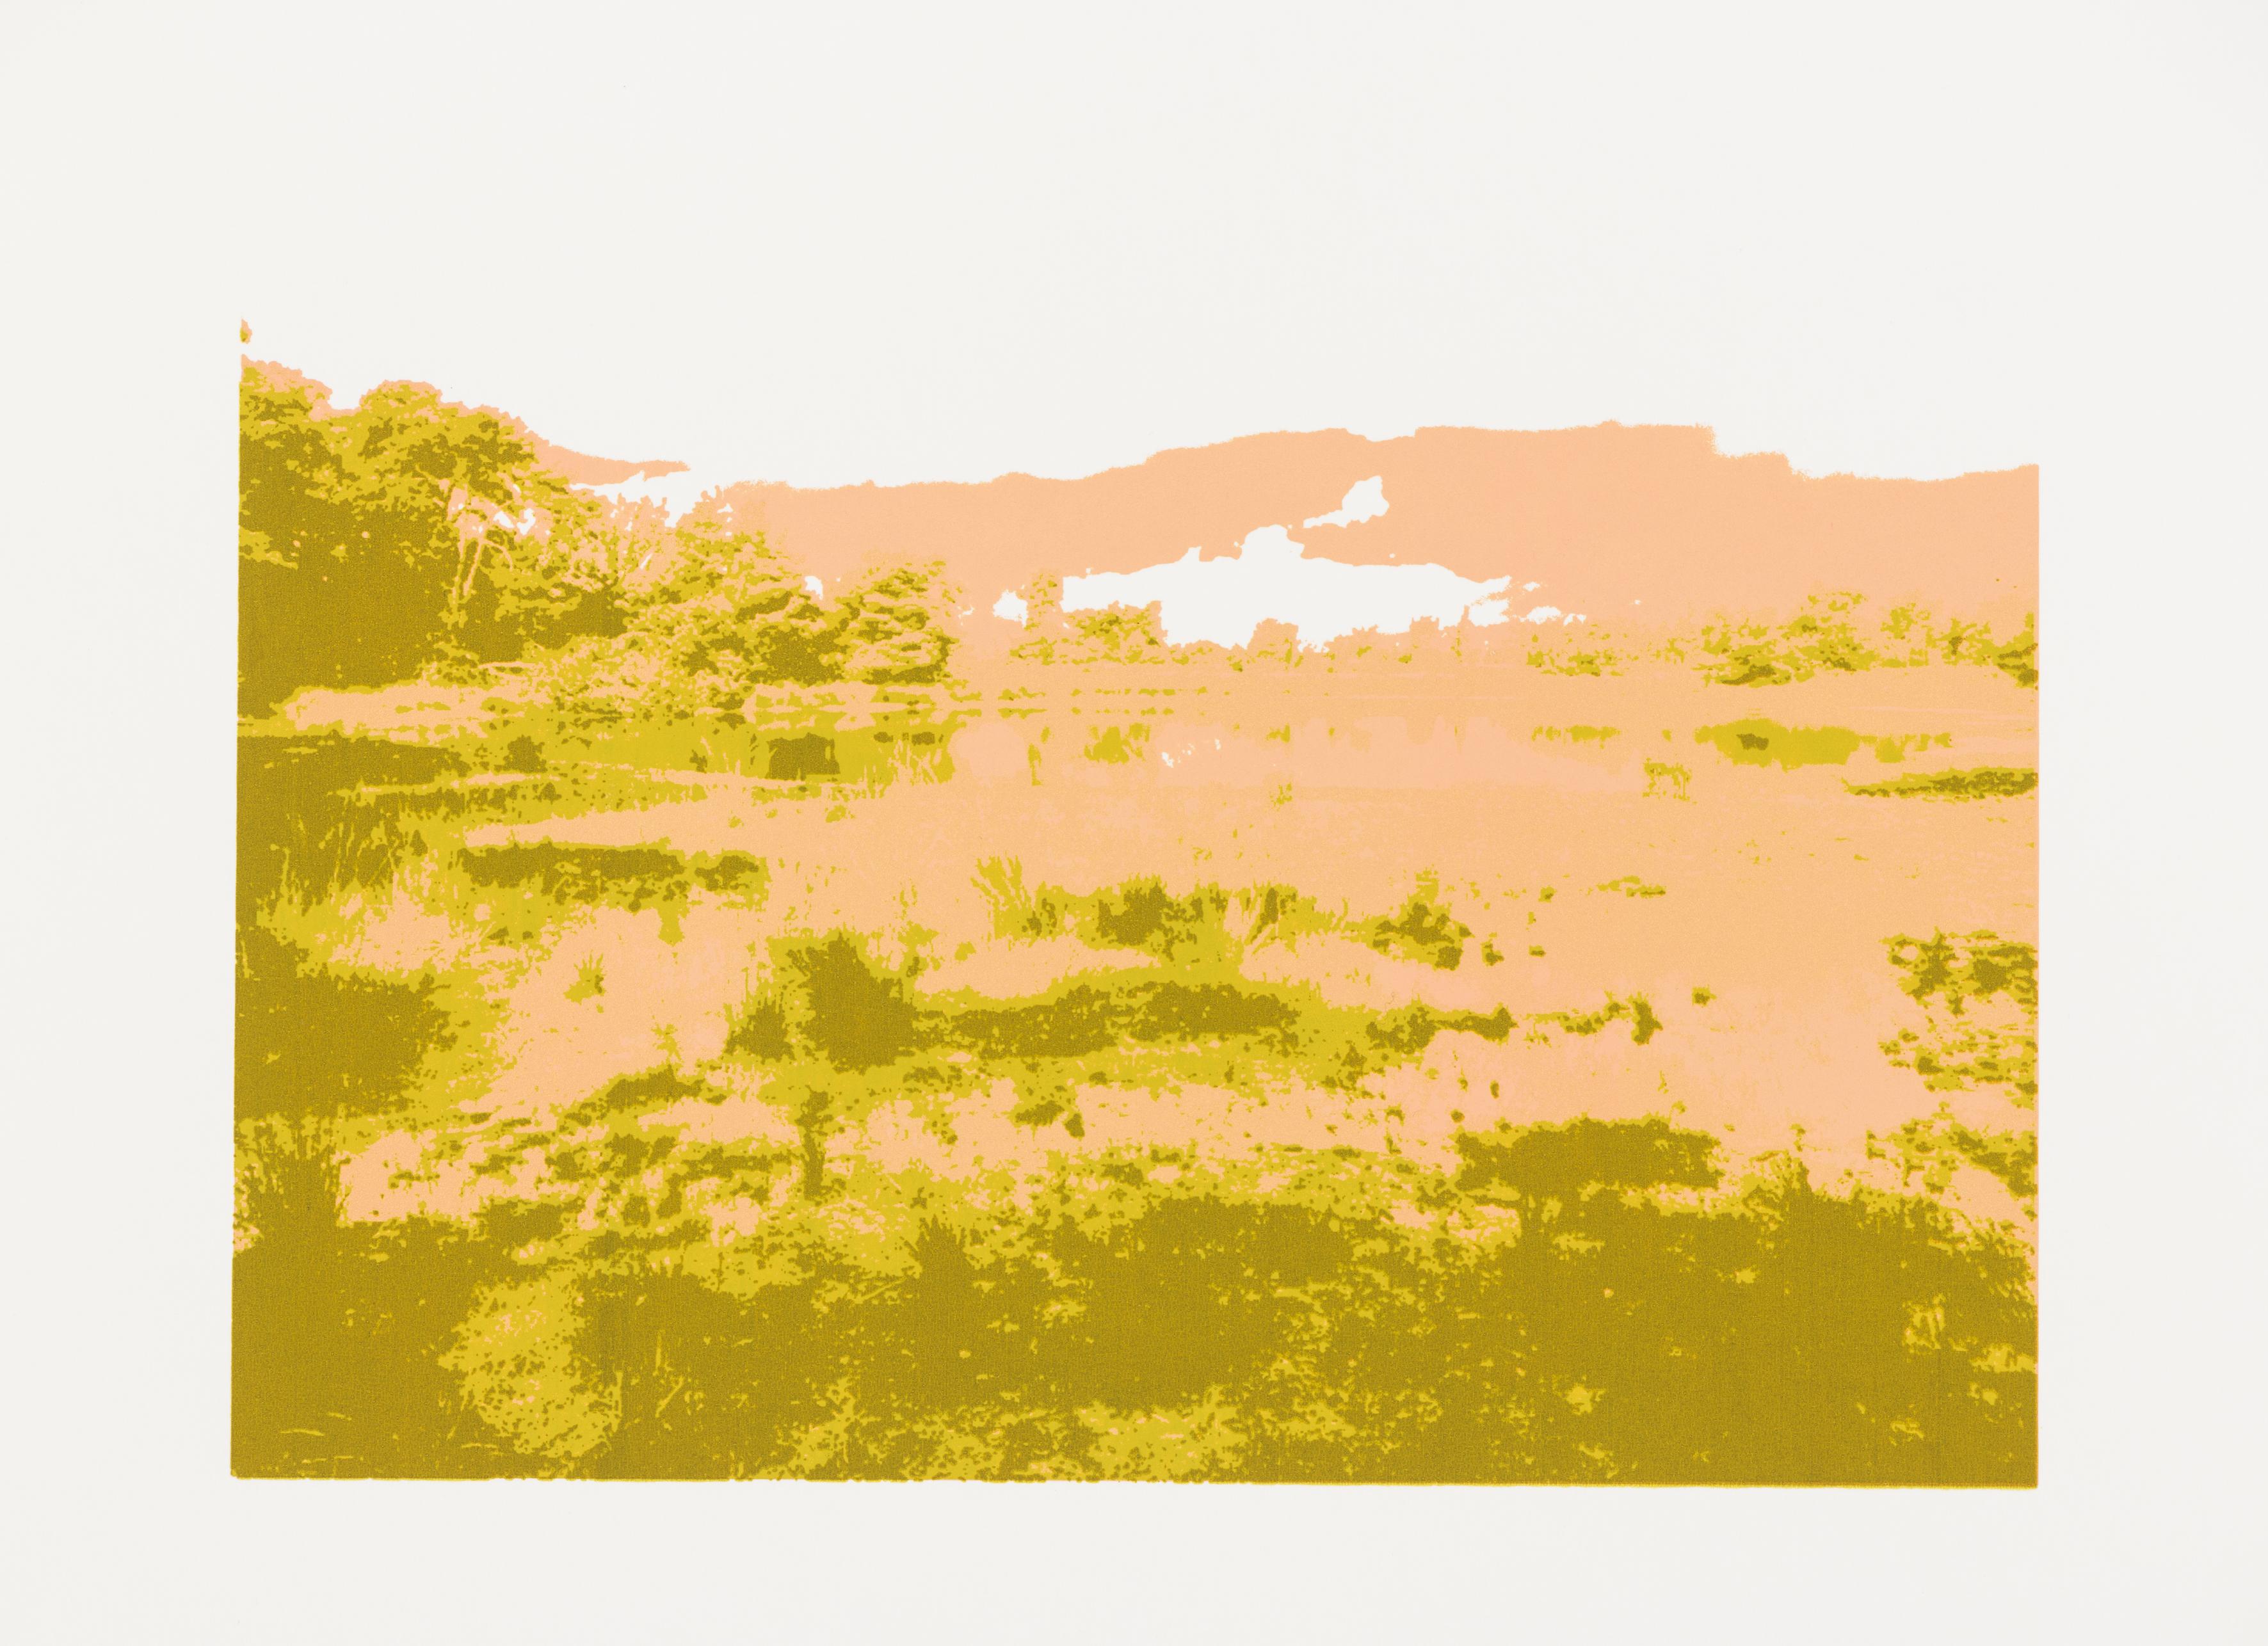 """Oude Buisse Heide"", A4, silkscreenprint (Printed at Beeldenstorm/Daglicht 2018, Special Edition for publication AiR Van GoghHuis)"